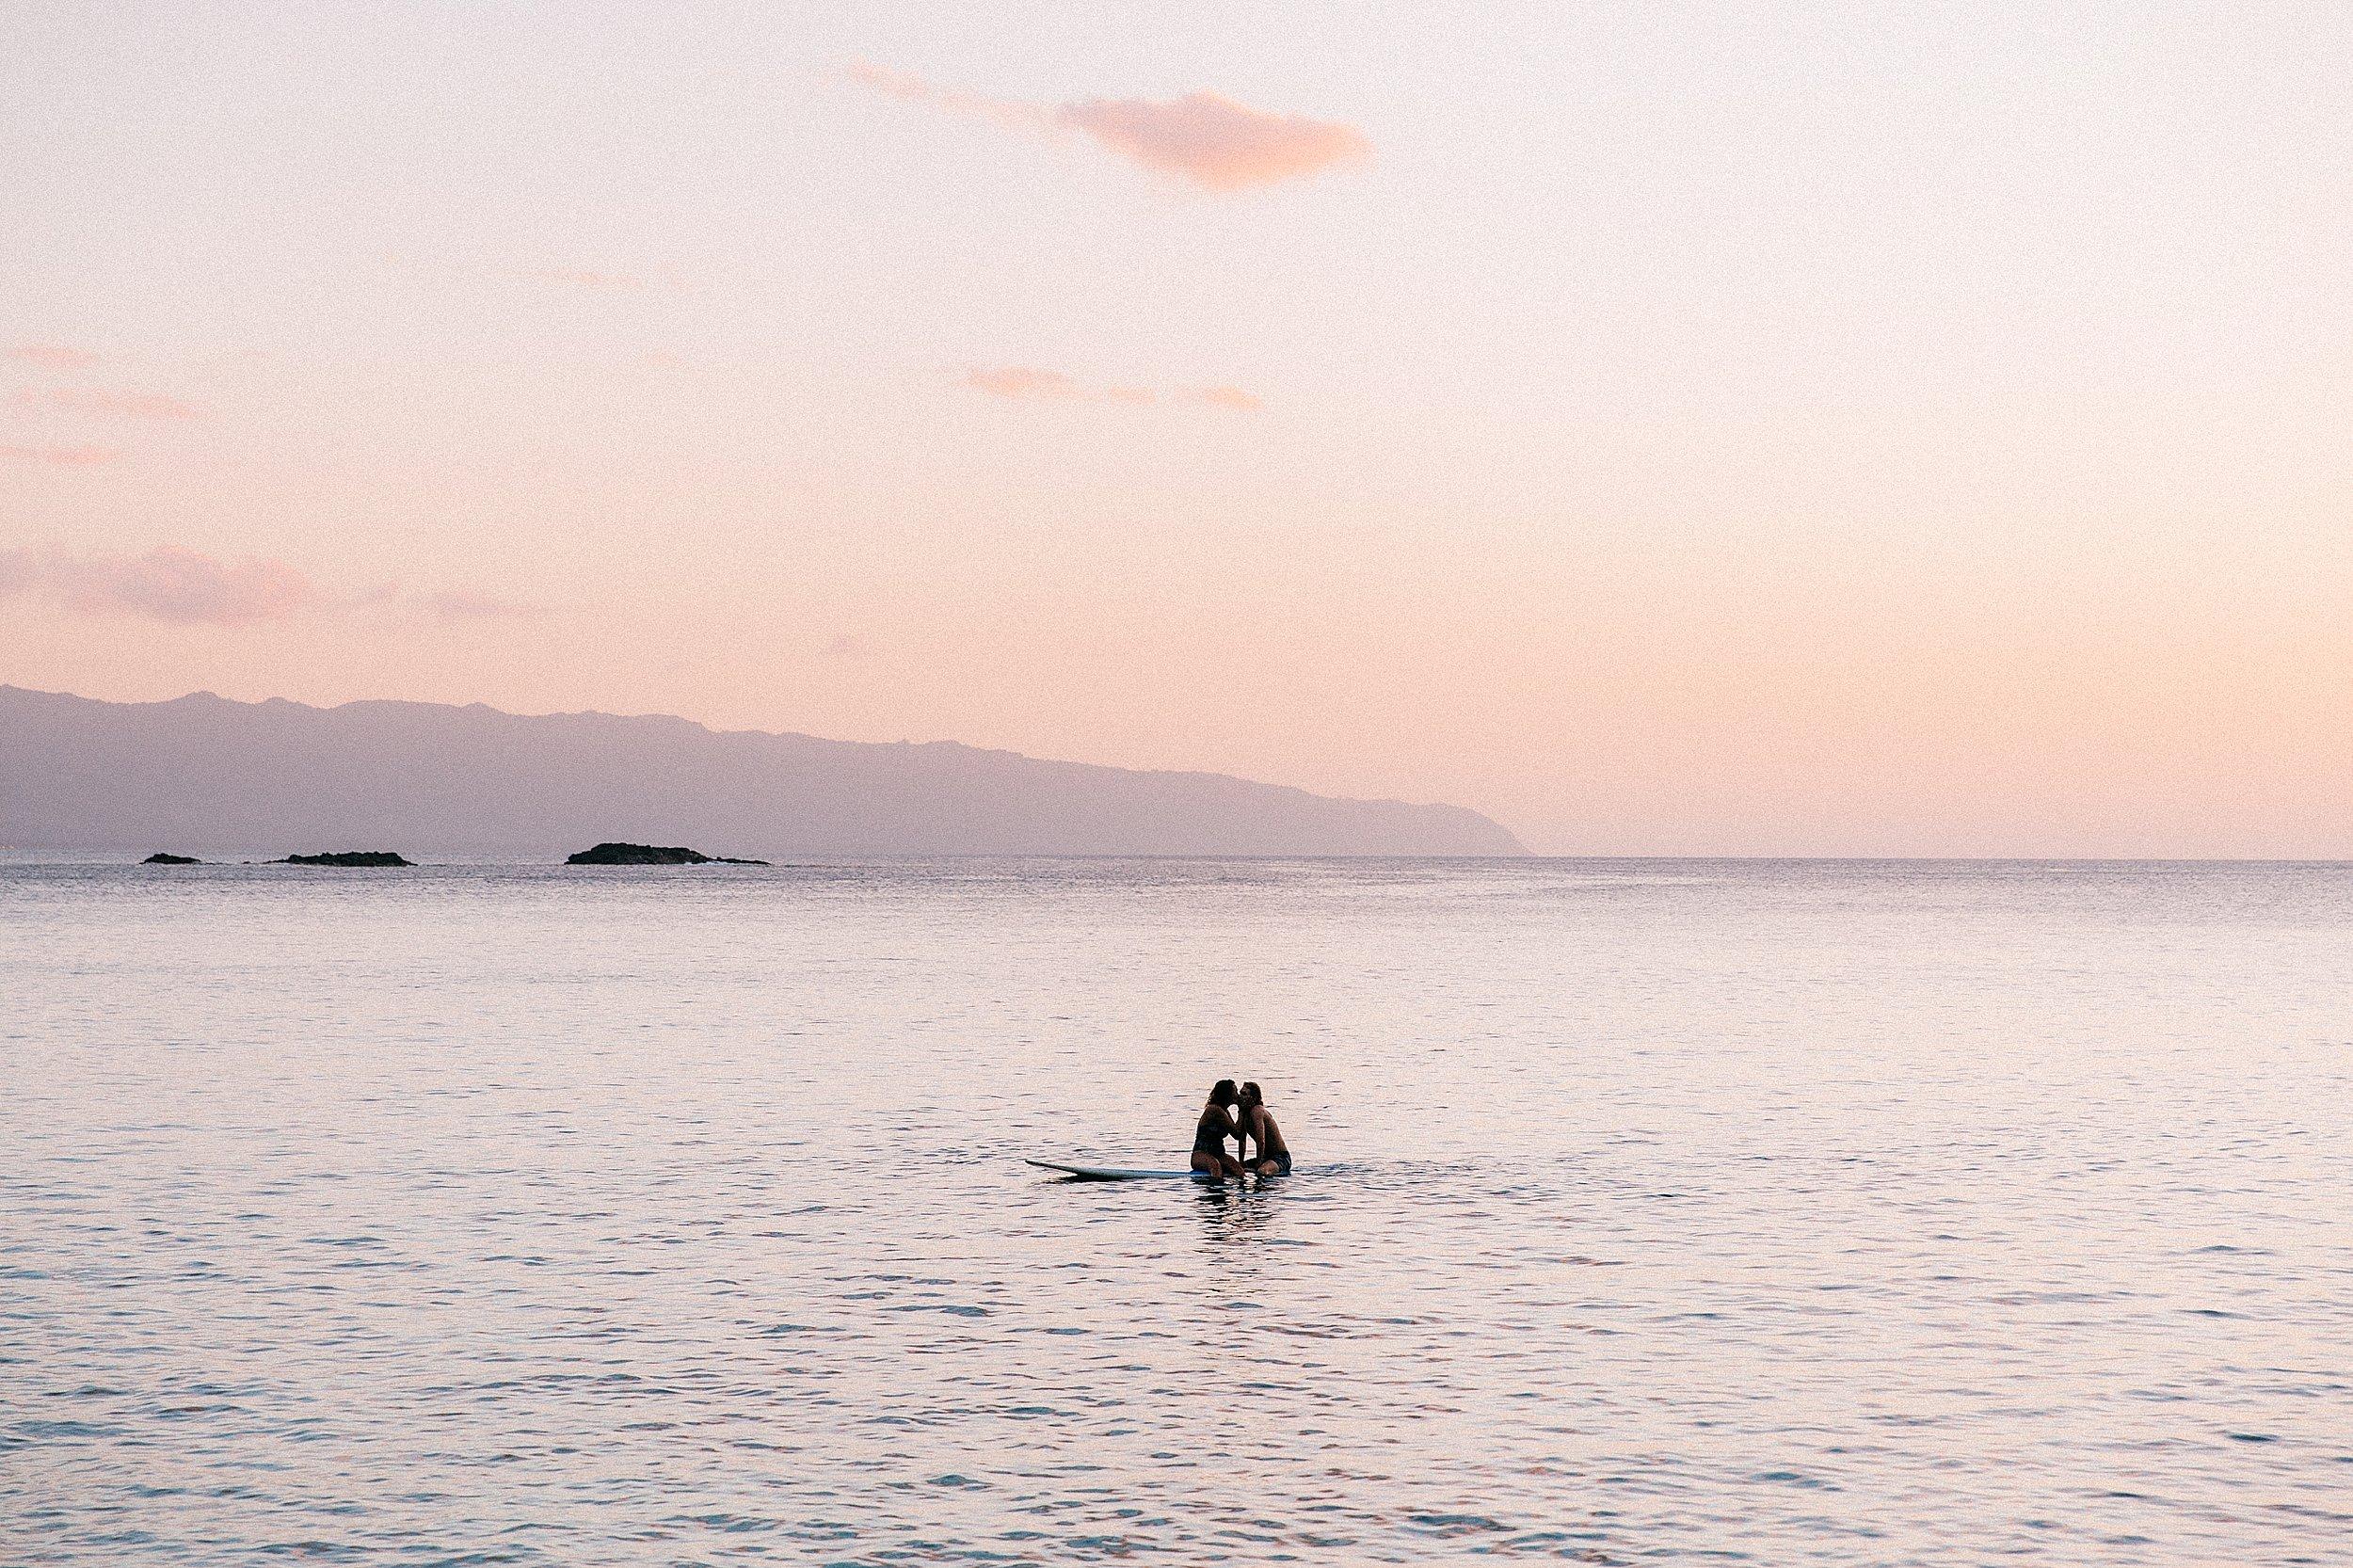 Sunset Proposal at Waimea Bay on Oahu's North Shore